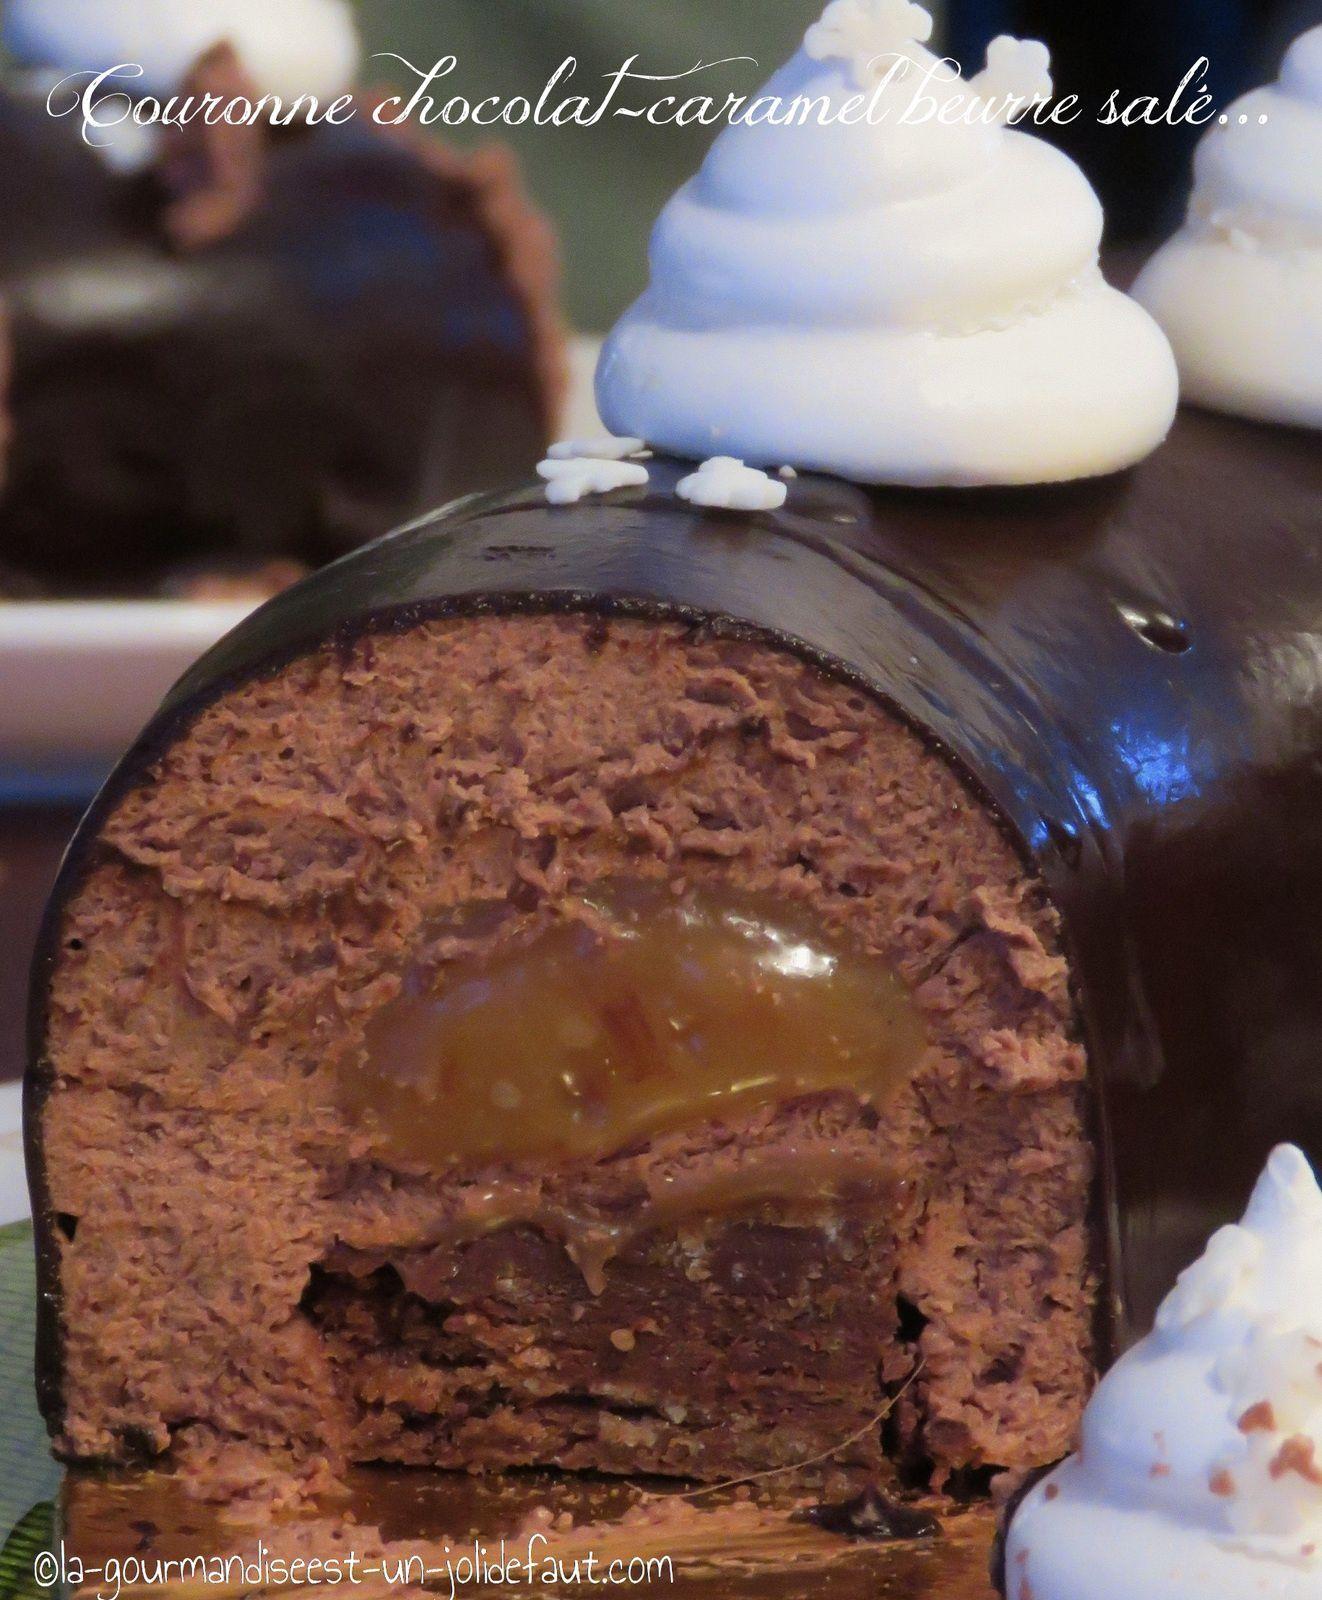 Couronne chocolat-caramel au beurre salé